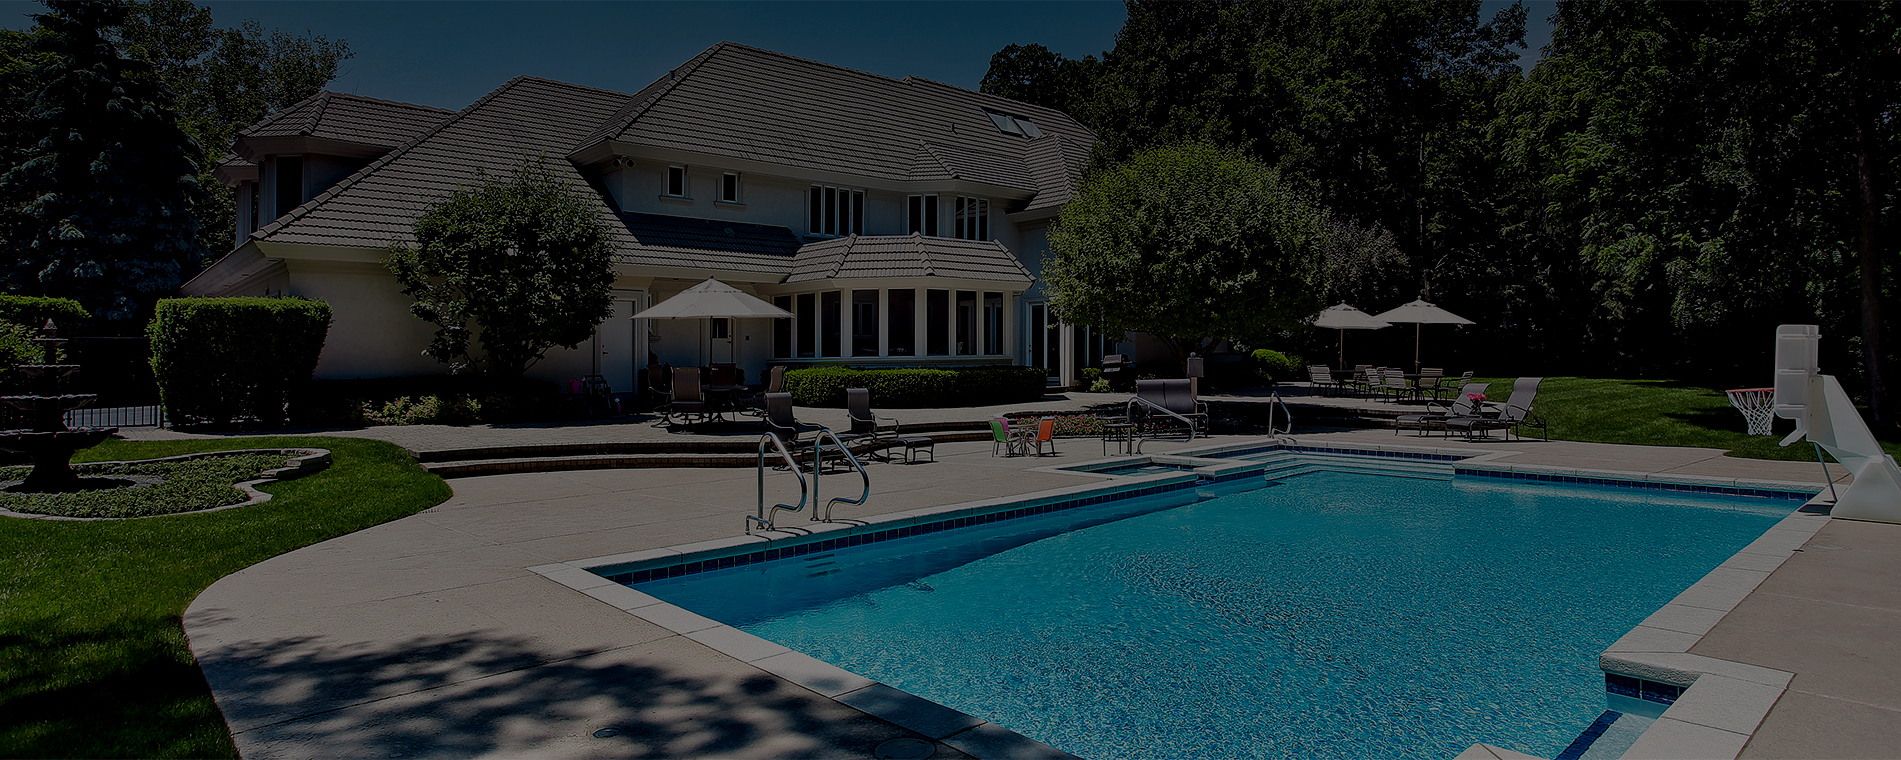 LUX Piscine, piscine luxembourg, rénovation piscine luxembourg